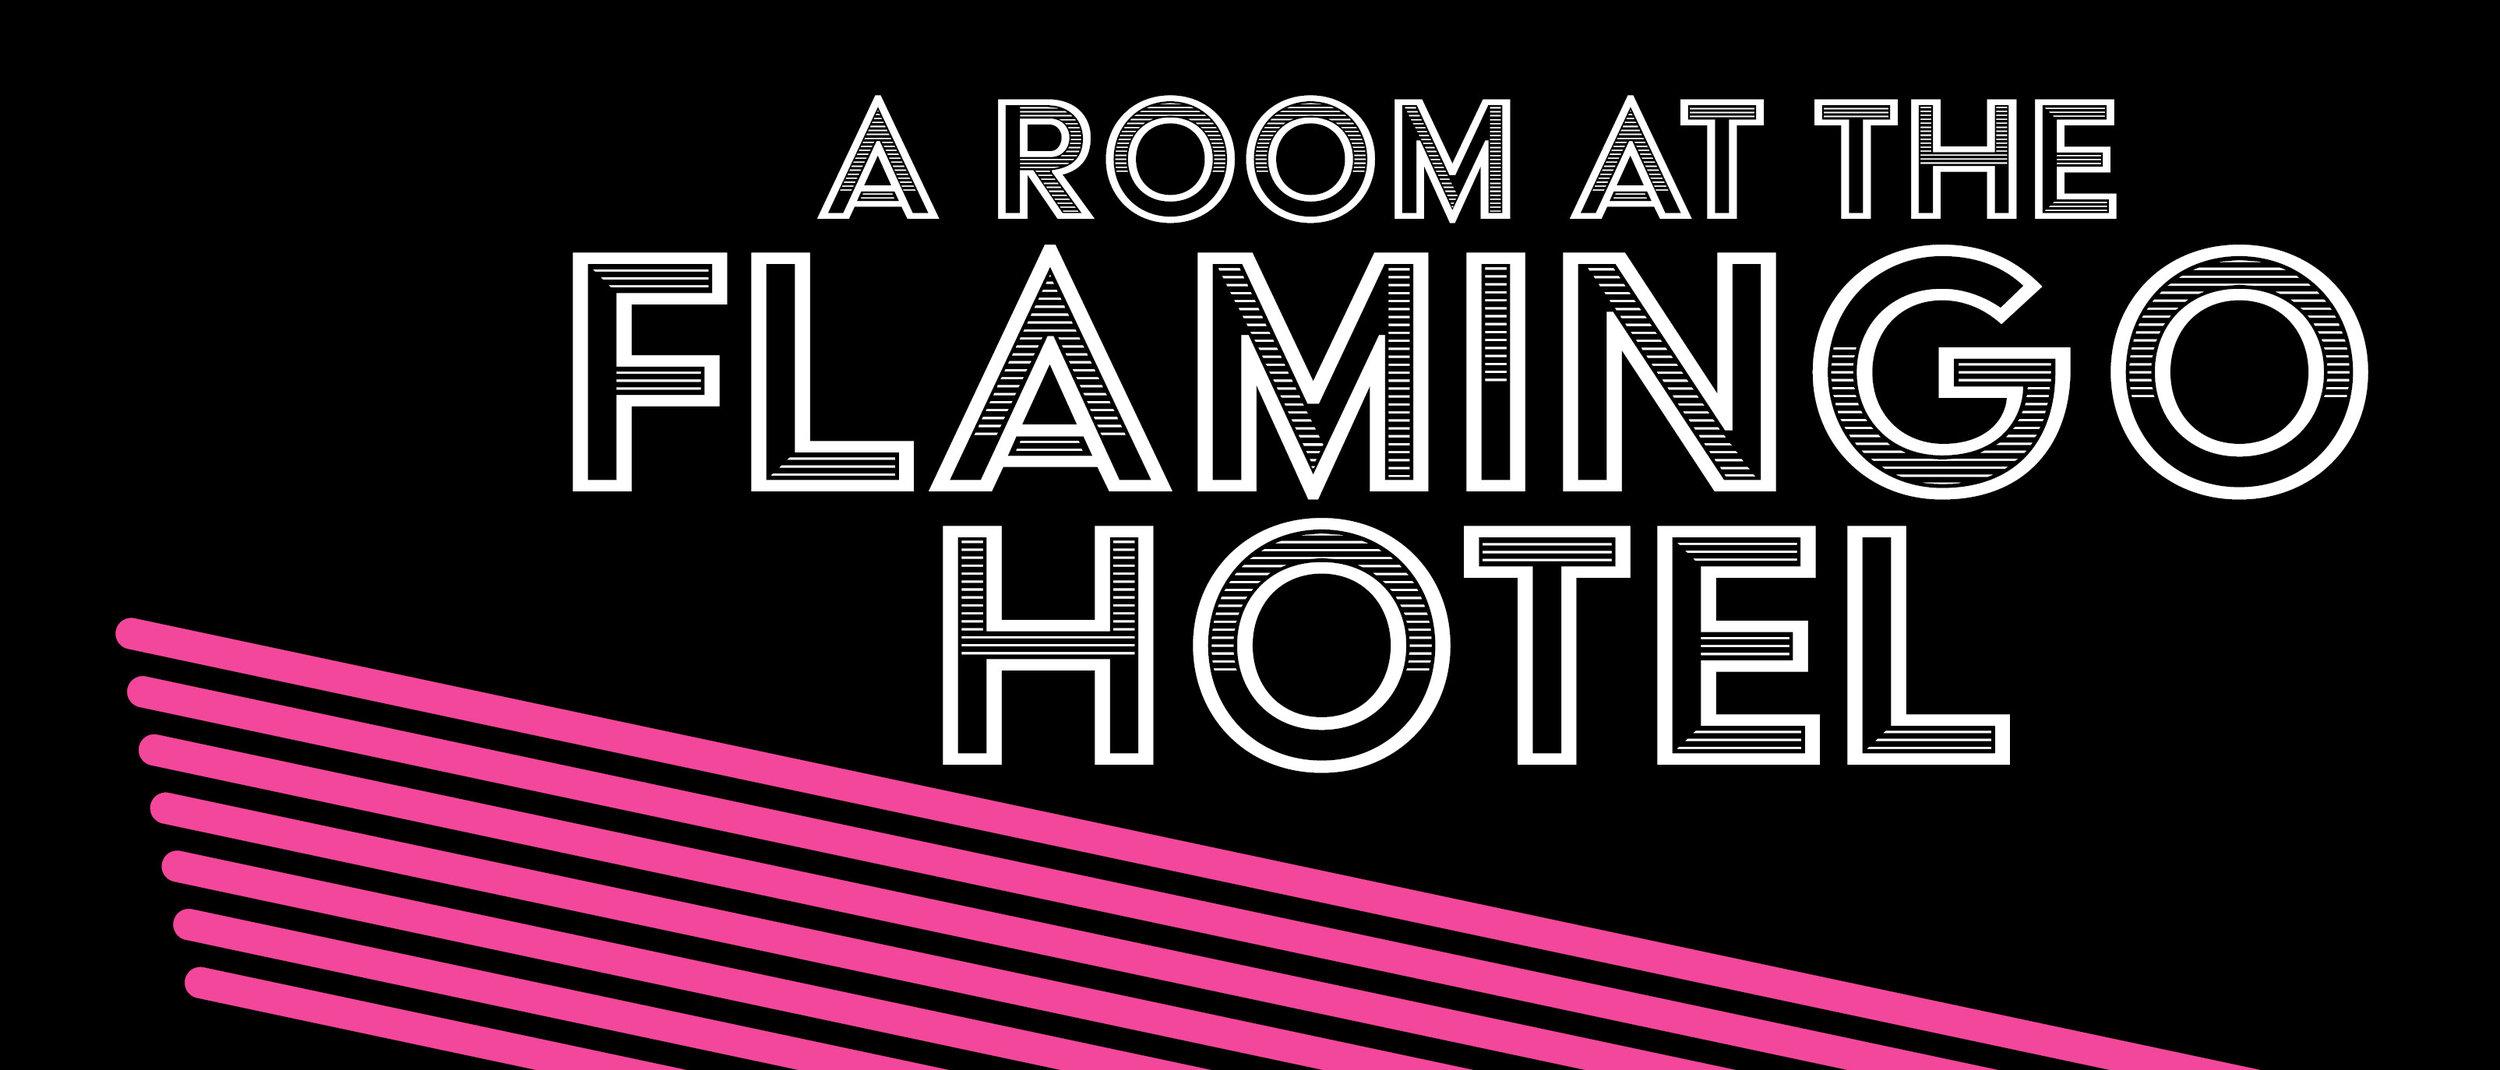 Website Header_Flamingo Hotel_HOLD.jpg